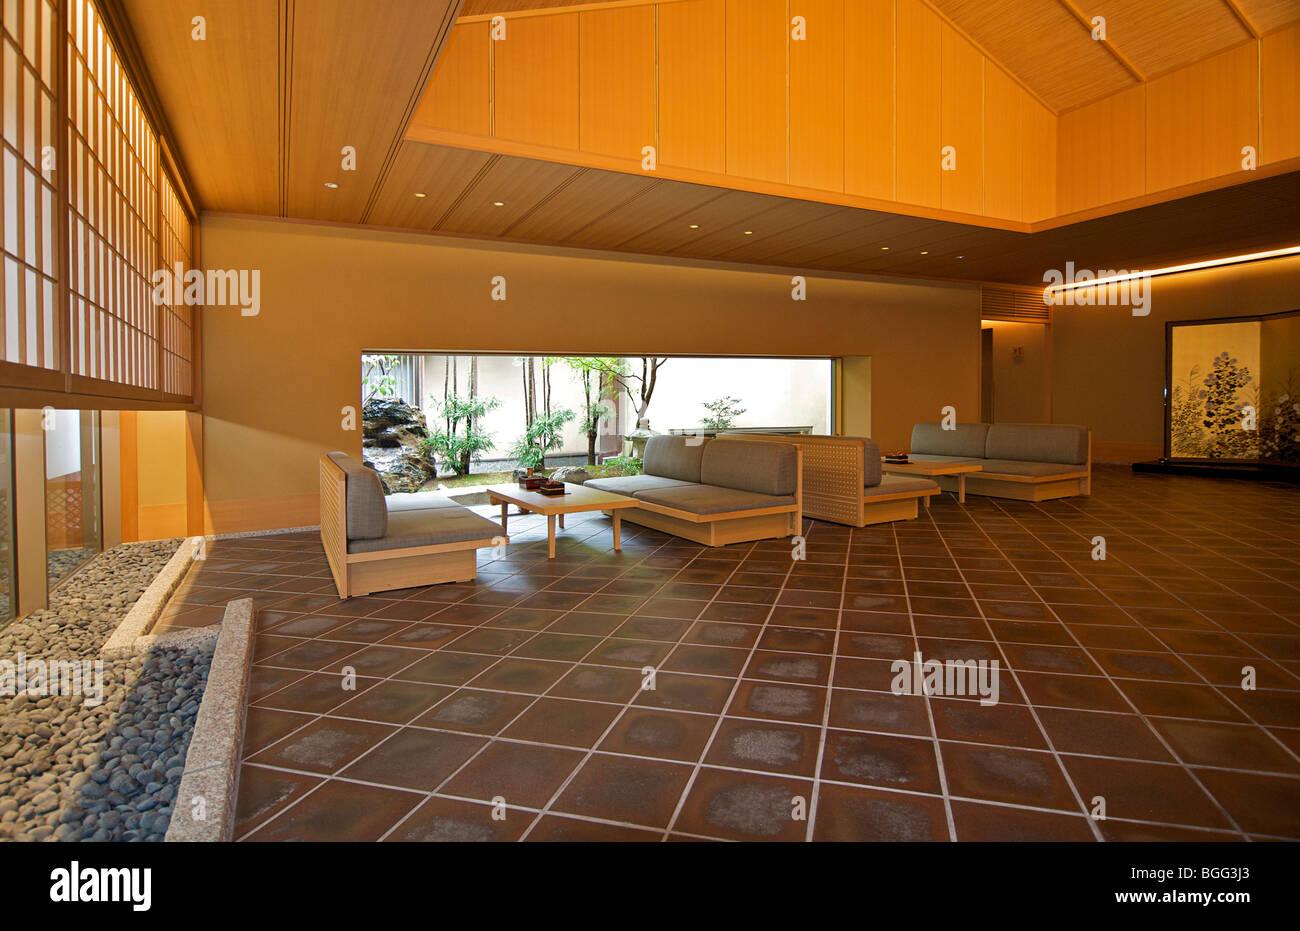 Gion Hatanaka. Japanese ryokan. Reception area.  A traditional style guest house. Kyoto, Japan - Stock Image